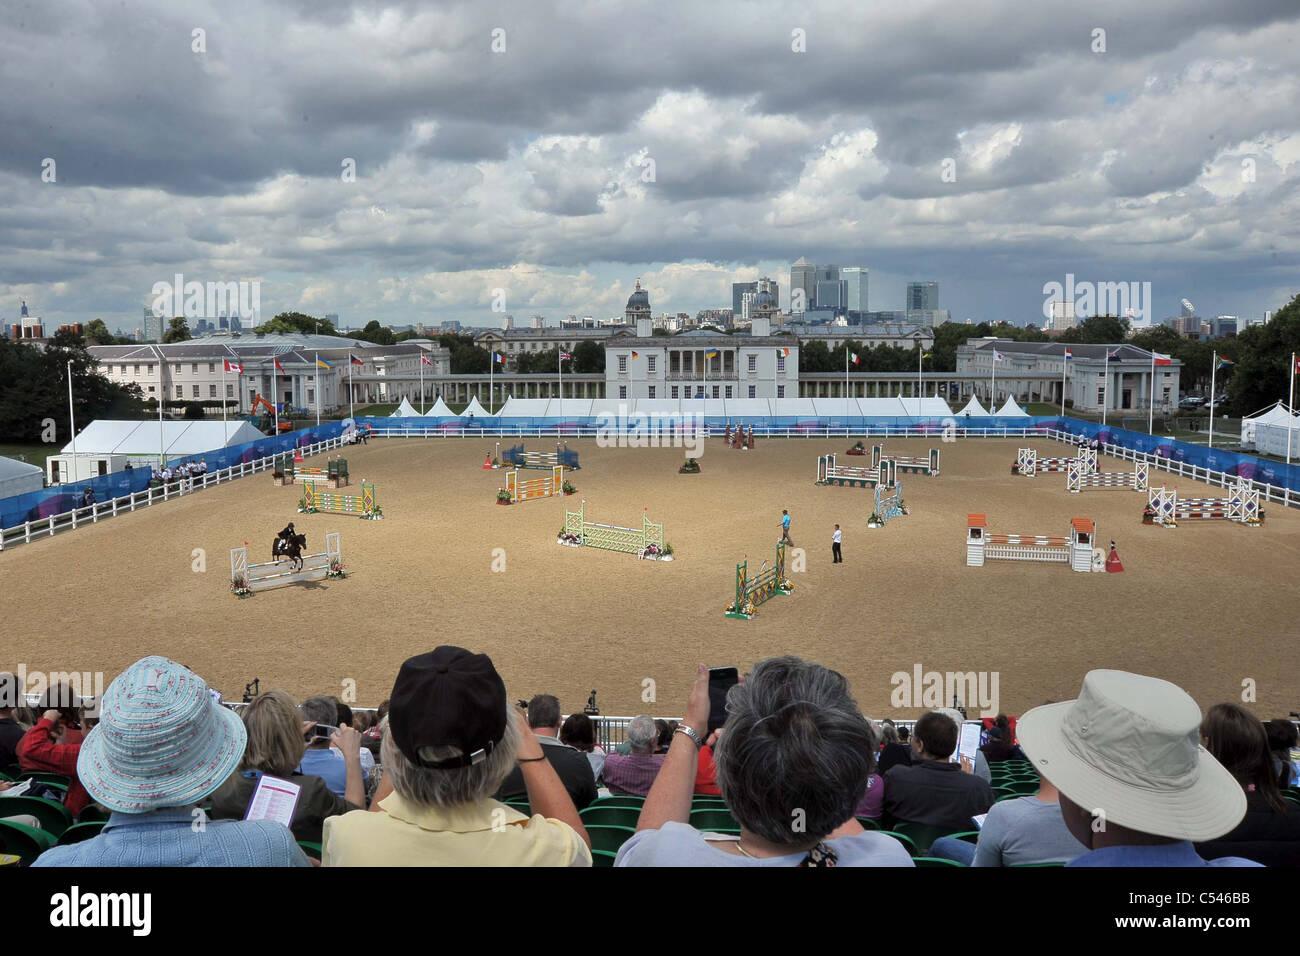 La multitud mira como Andreas Riedl caballo Jabadaba Doo (Austria) salta. Show Jumping Demostración de Competencia. Imagen De Stock